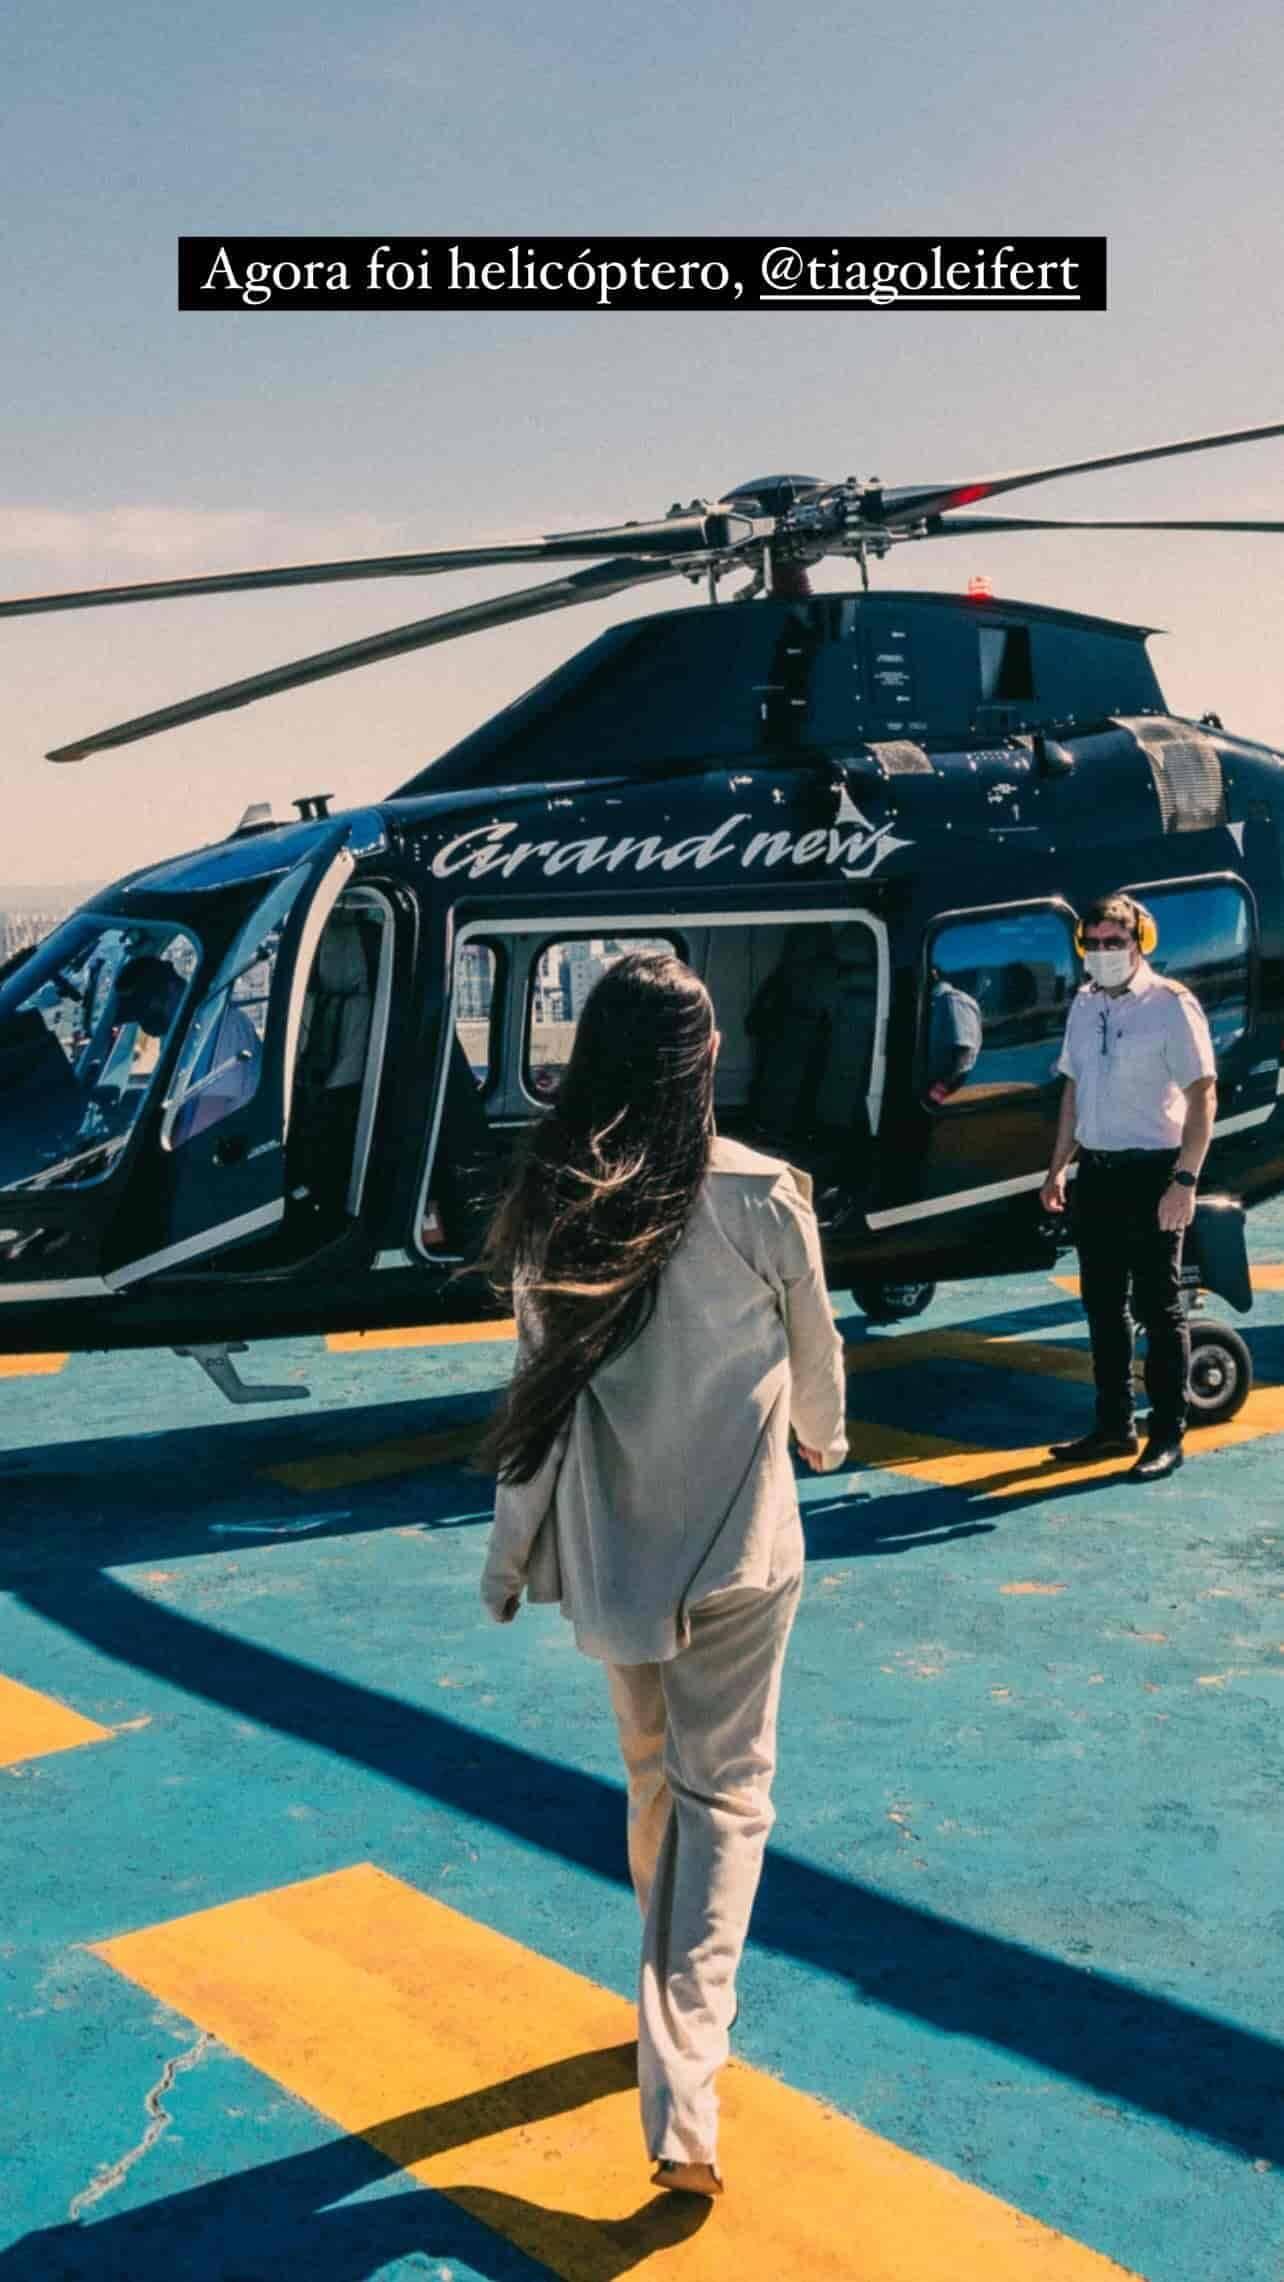 Juliette Freire curte andar de helicóptero: 'tô chique demais' (Foto: Reprodução/Instagram)